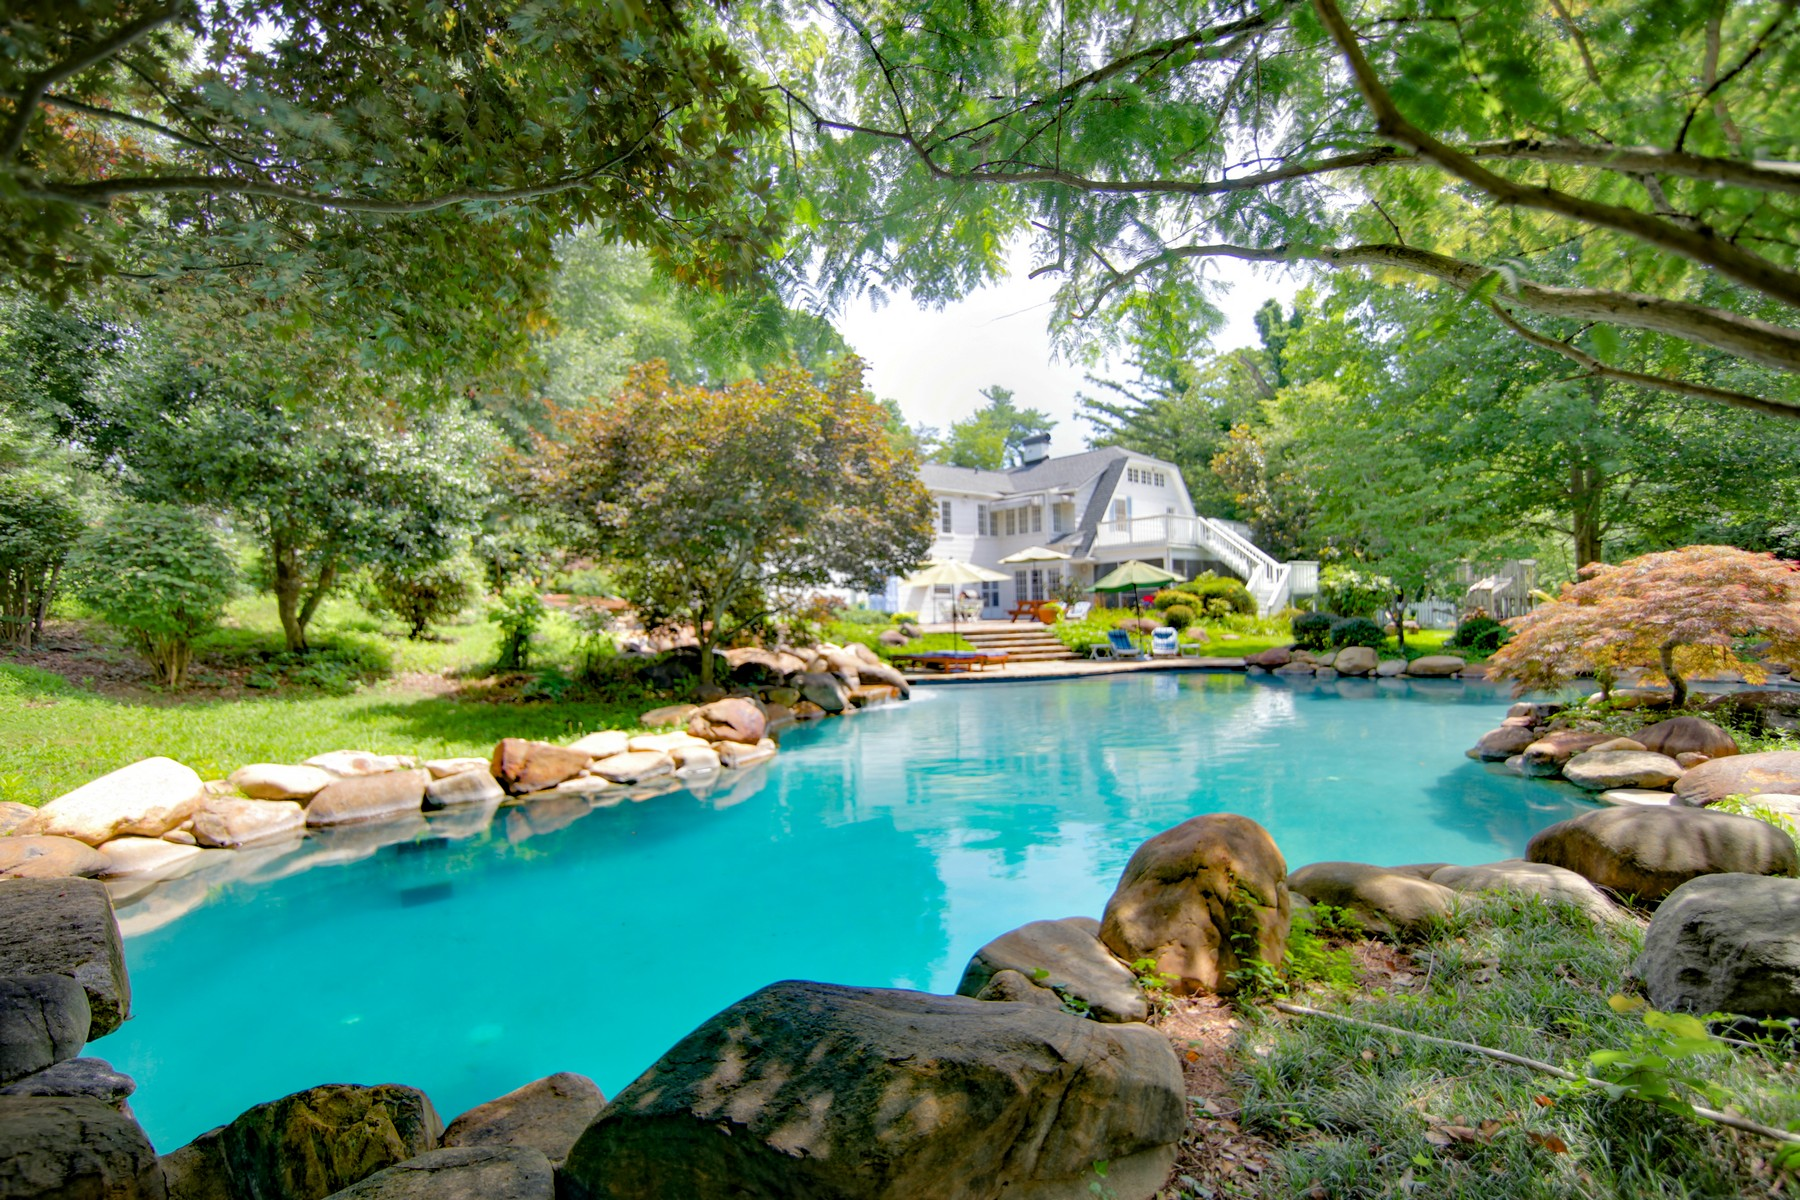 Single Family Homes for Active at 609 N. Washington Street in Rutherfordton, NC 609 N. Washington Street Rutherfordton, North Carolina 28139 United States